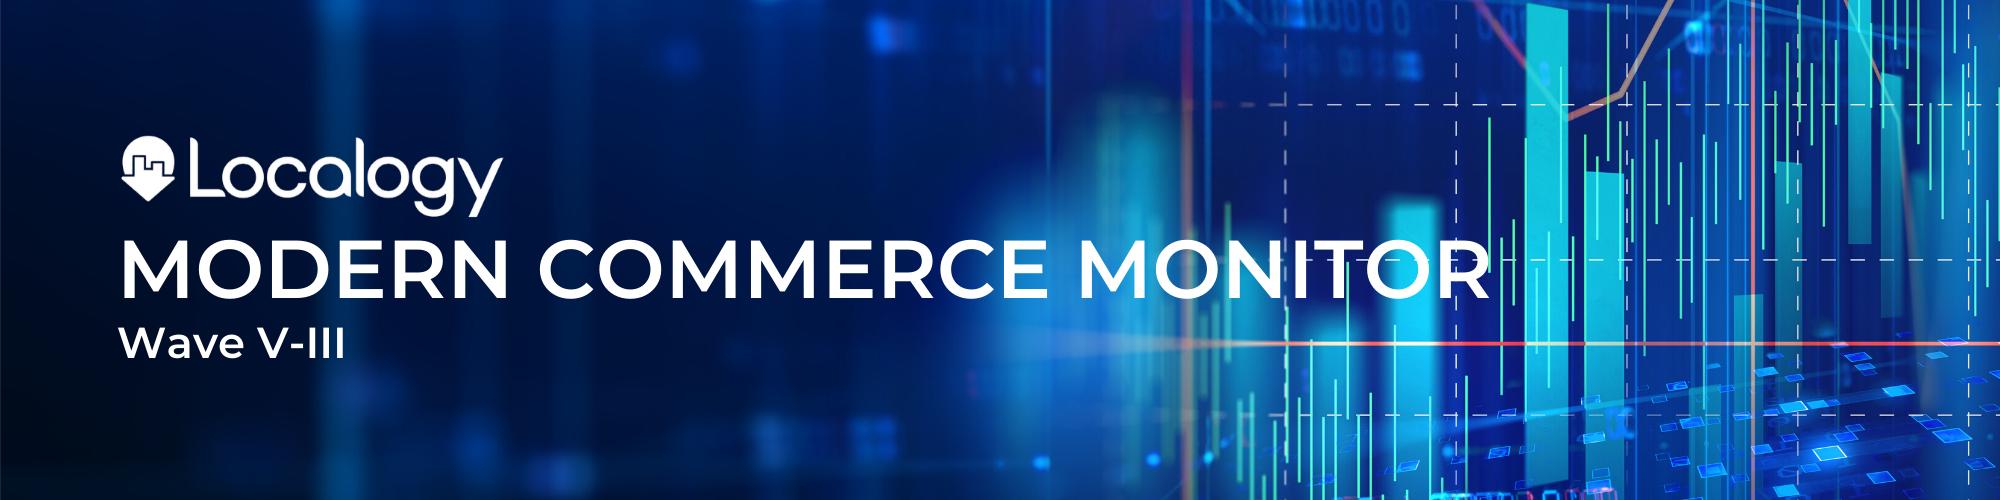 Website Banner - Modern Commerce Monitor Wave V-III